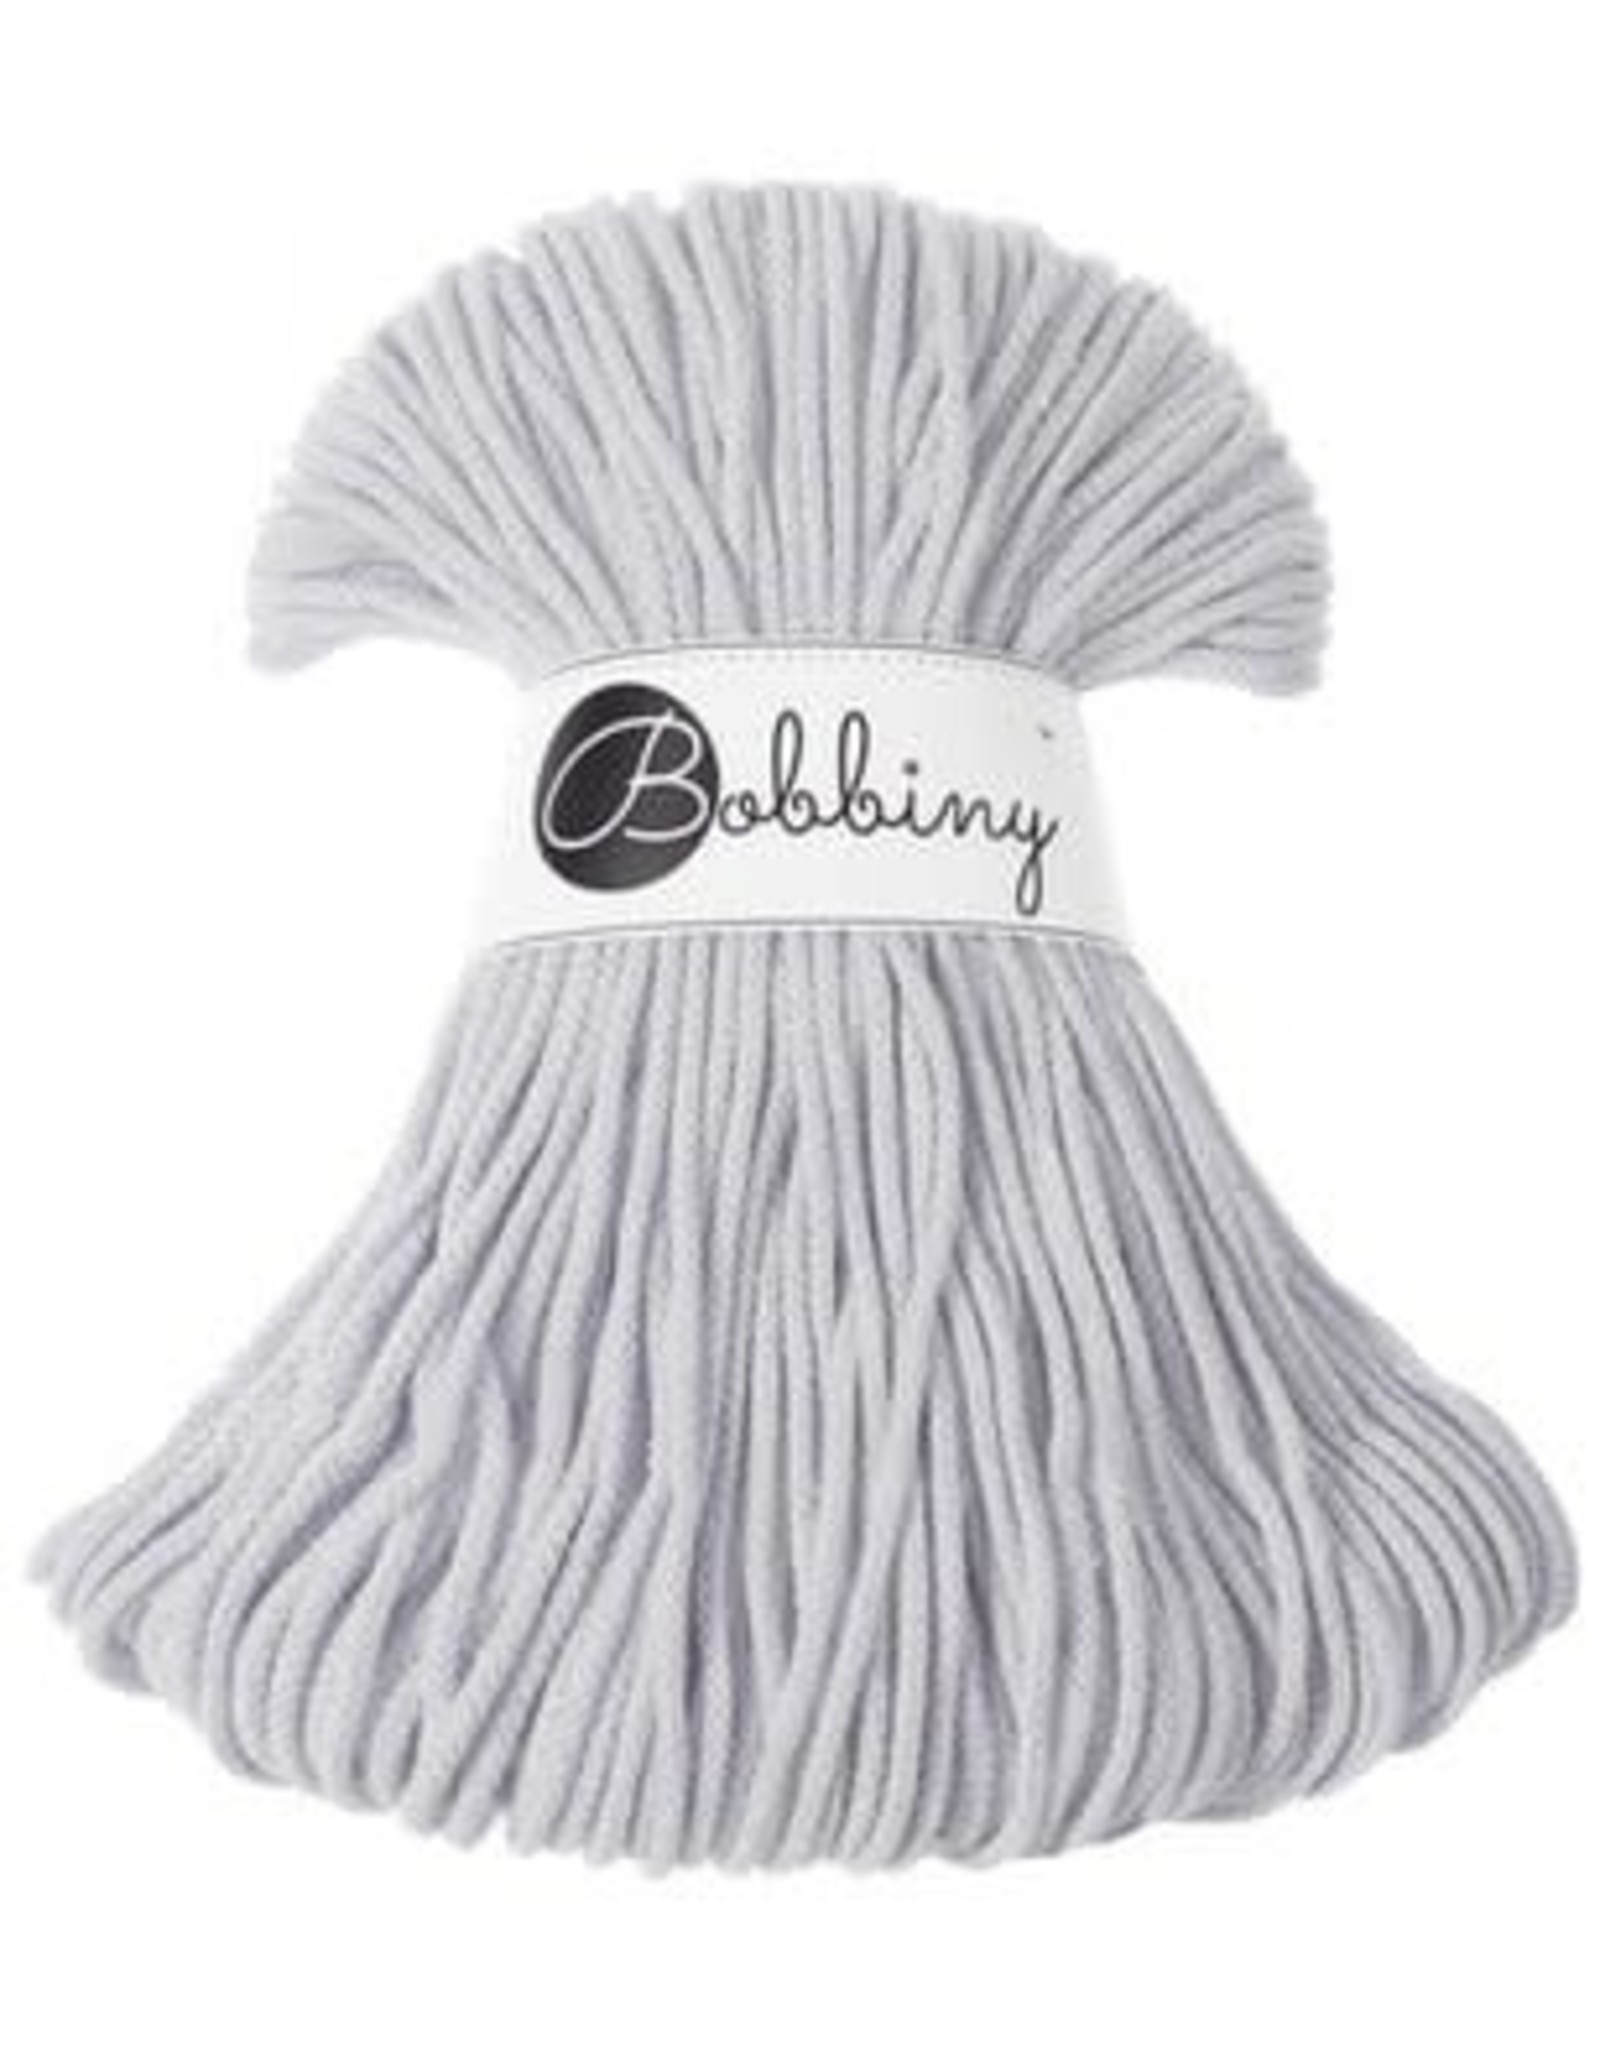 Bobbiny Bobbiny - Junior 3MM Light Grey